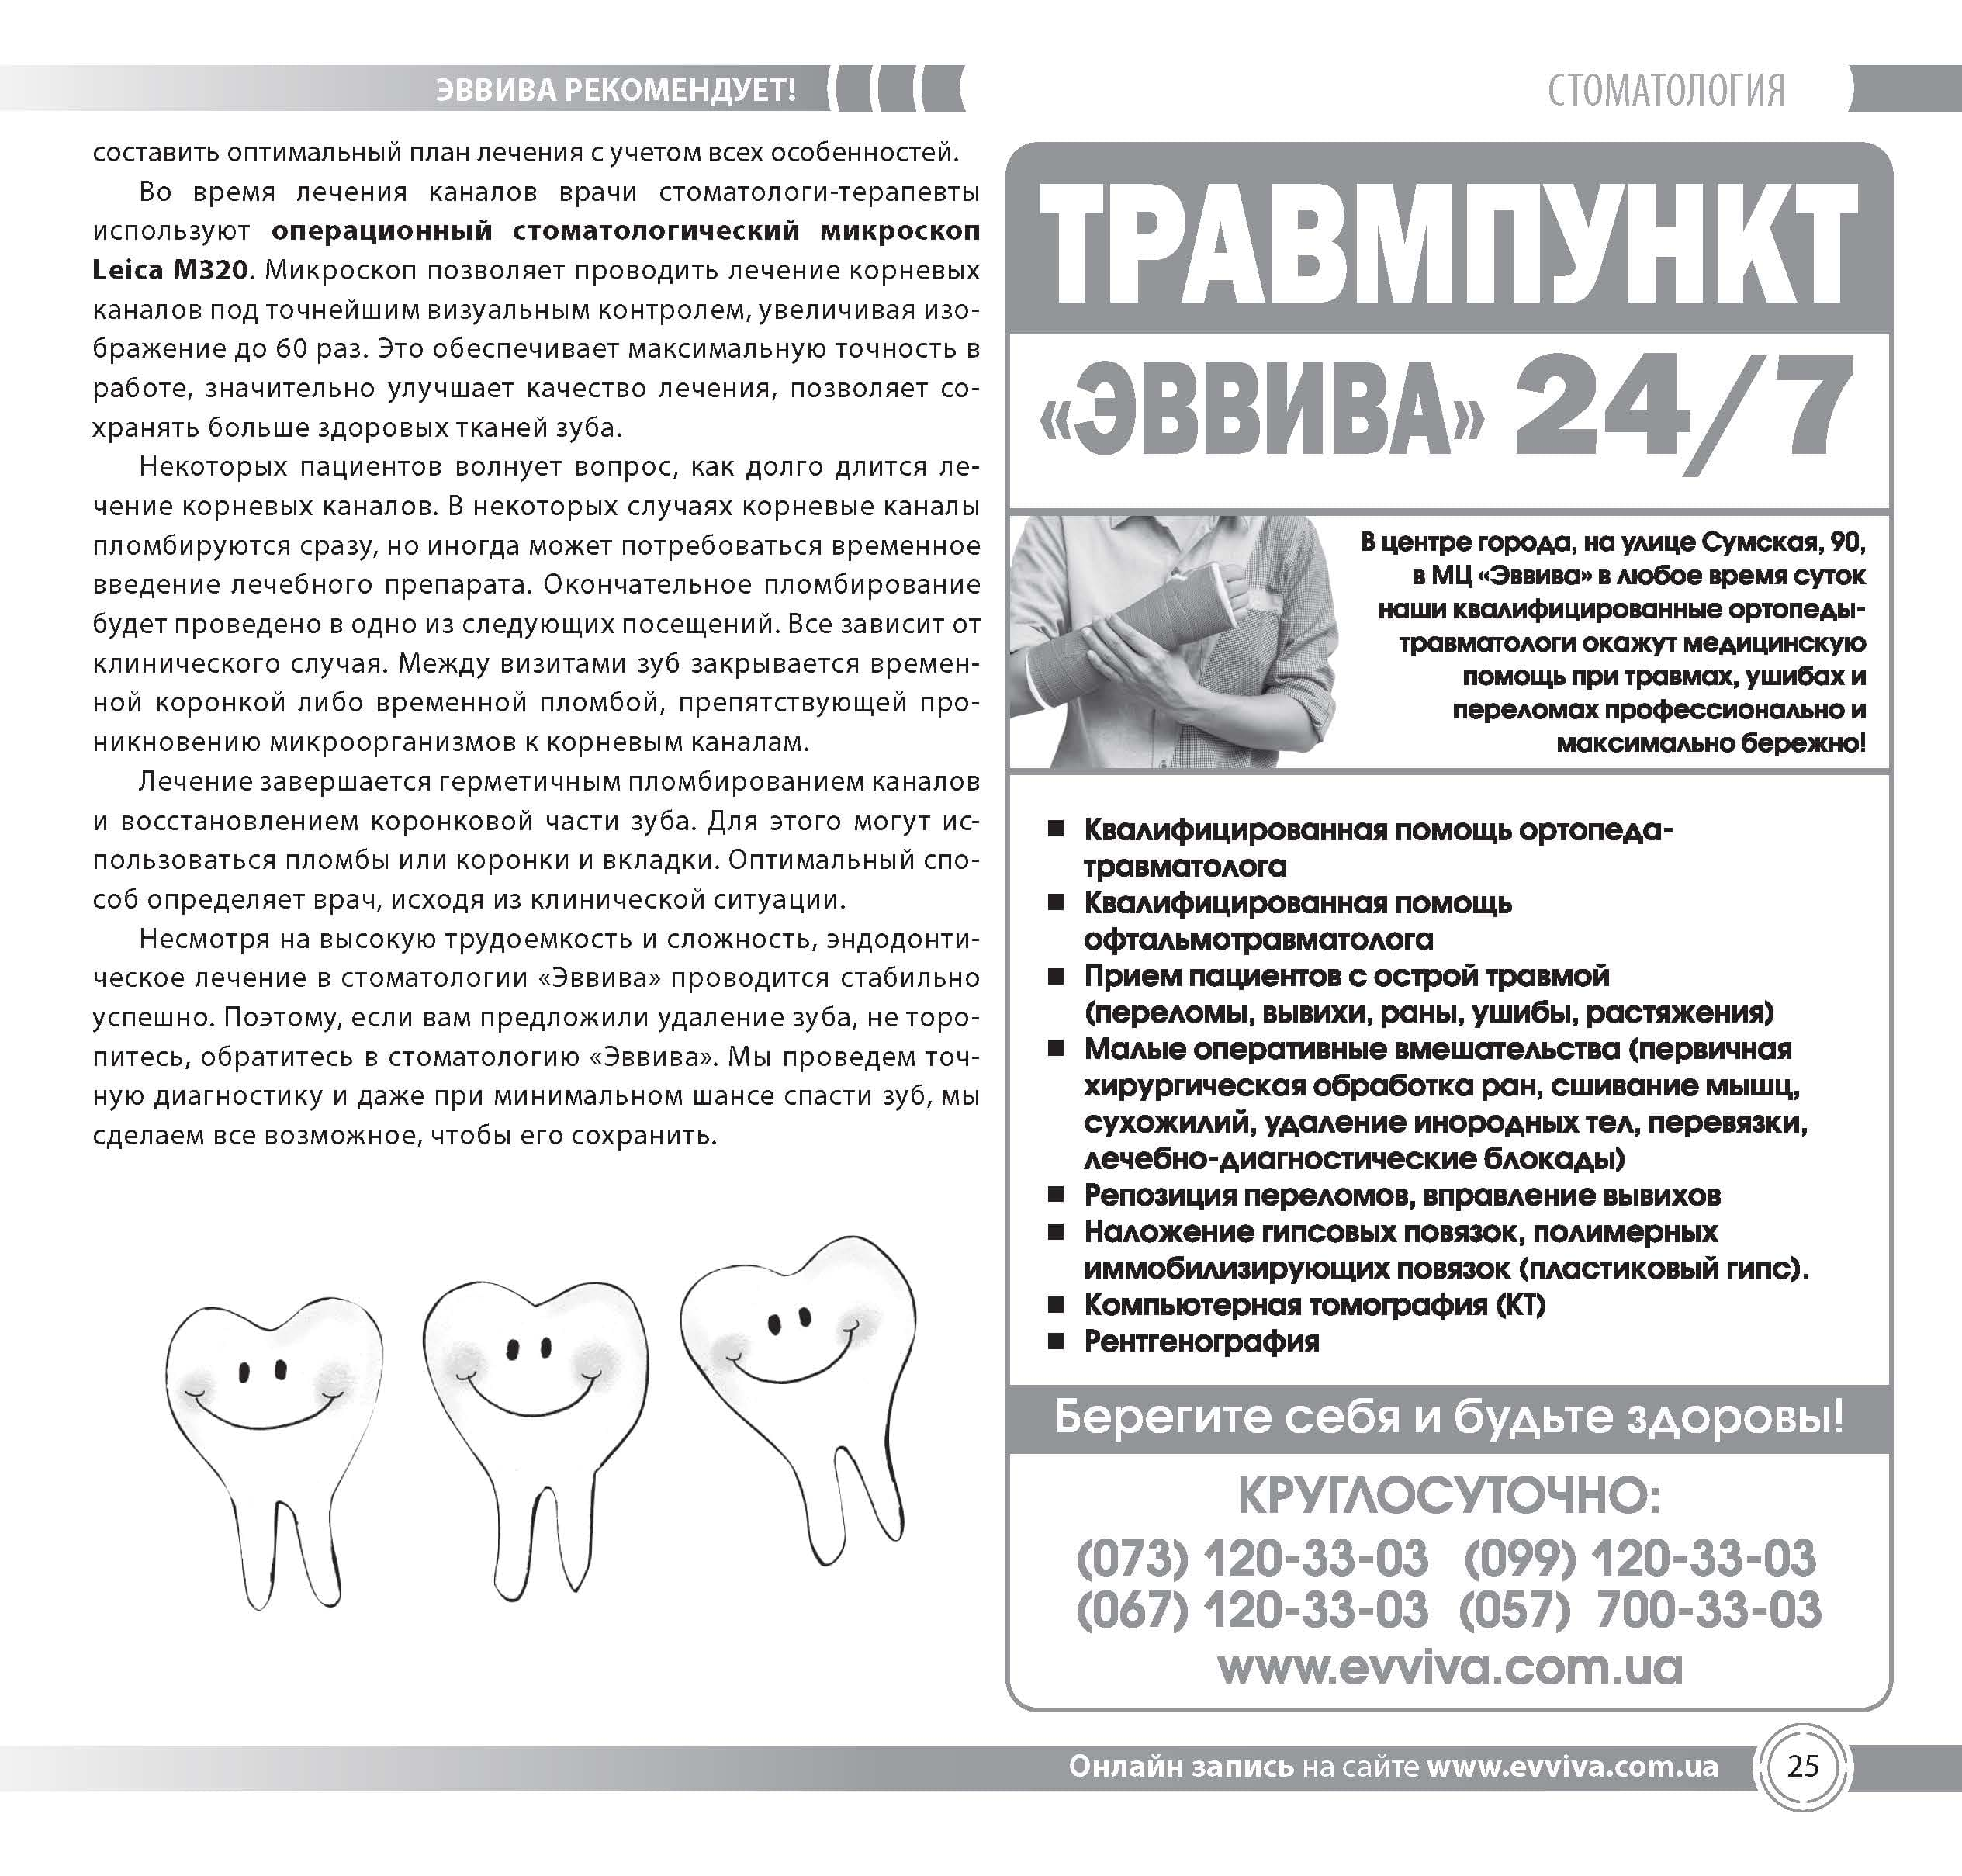 evviva-zhurnal-119-page25